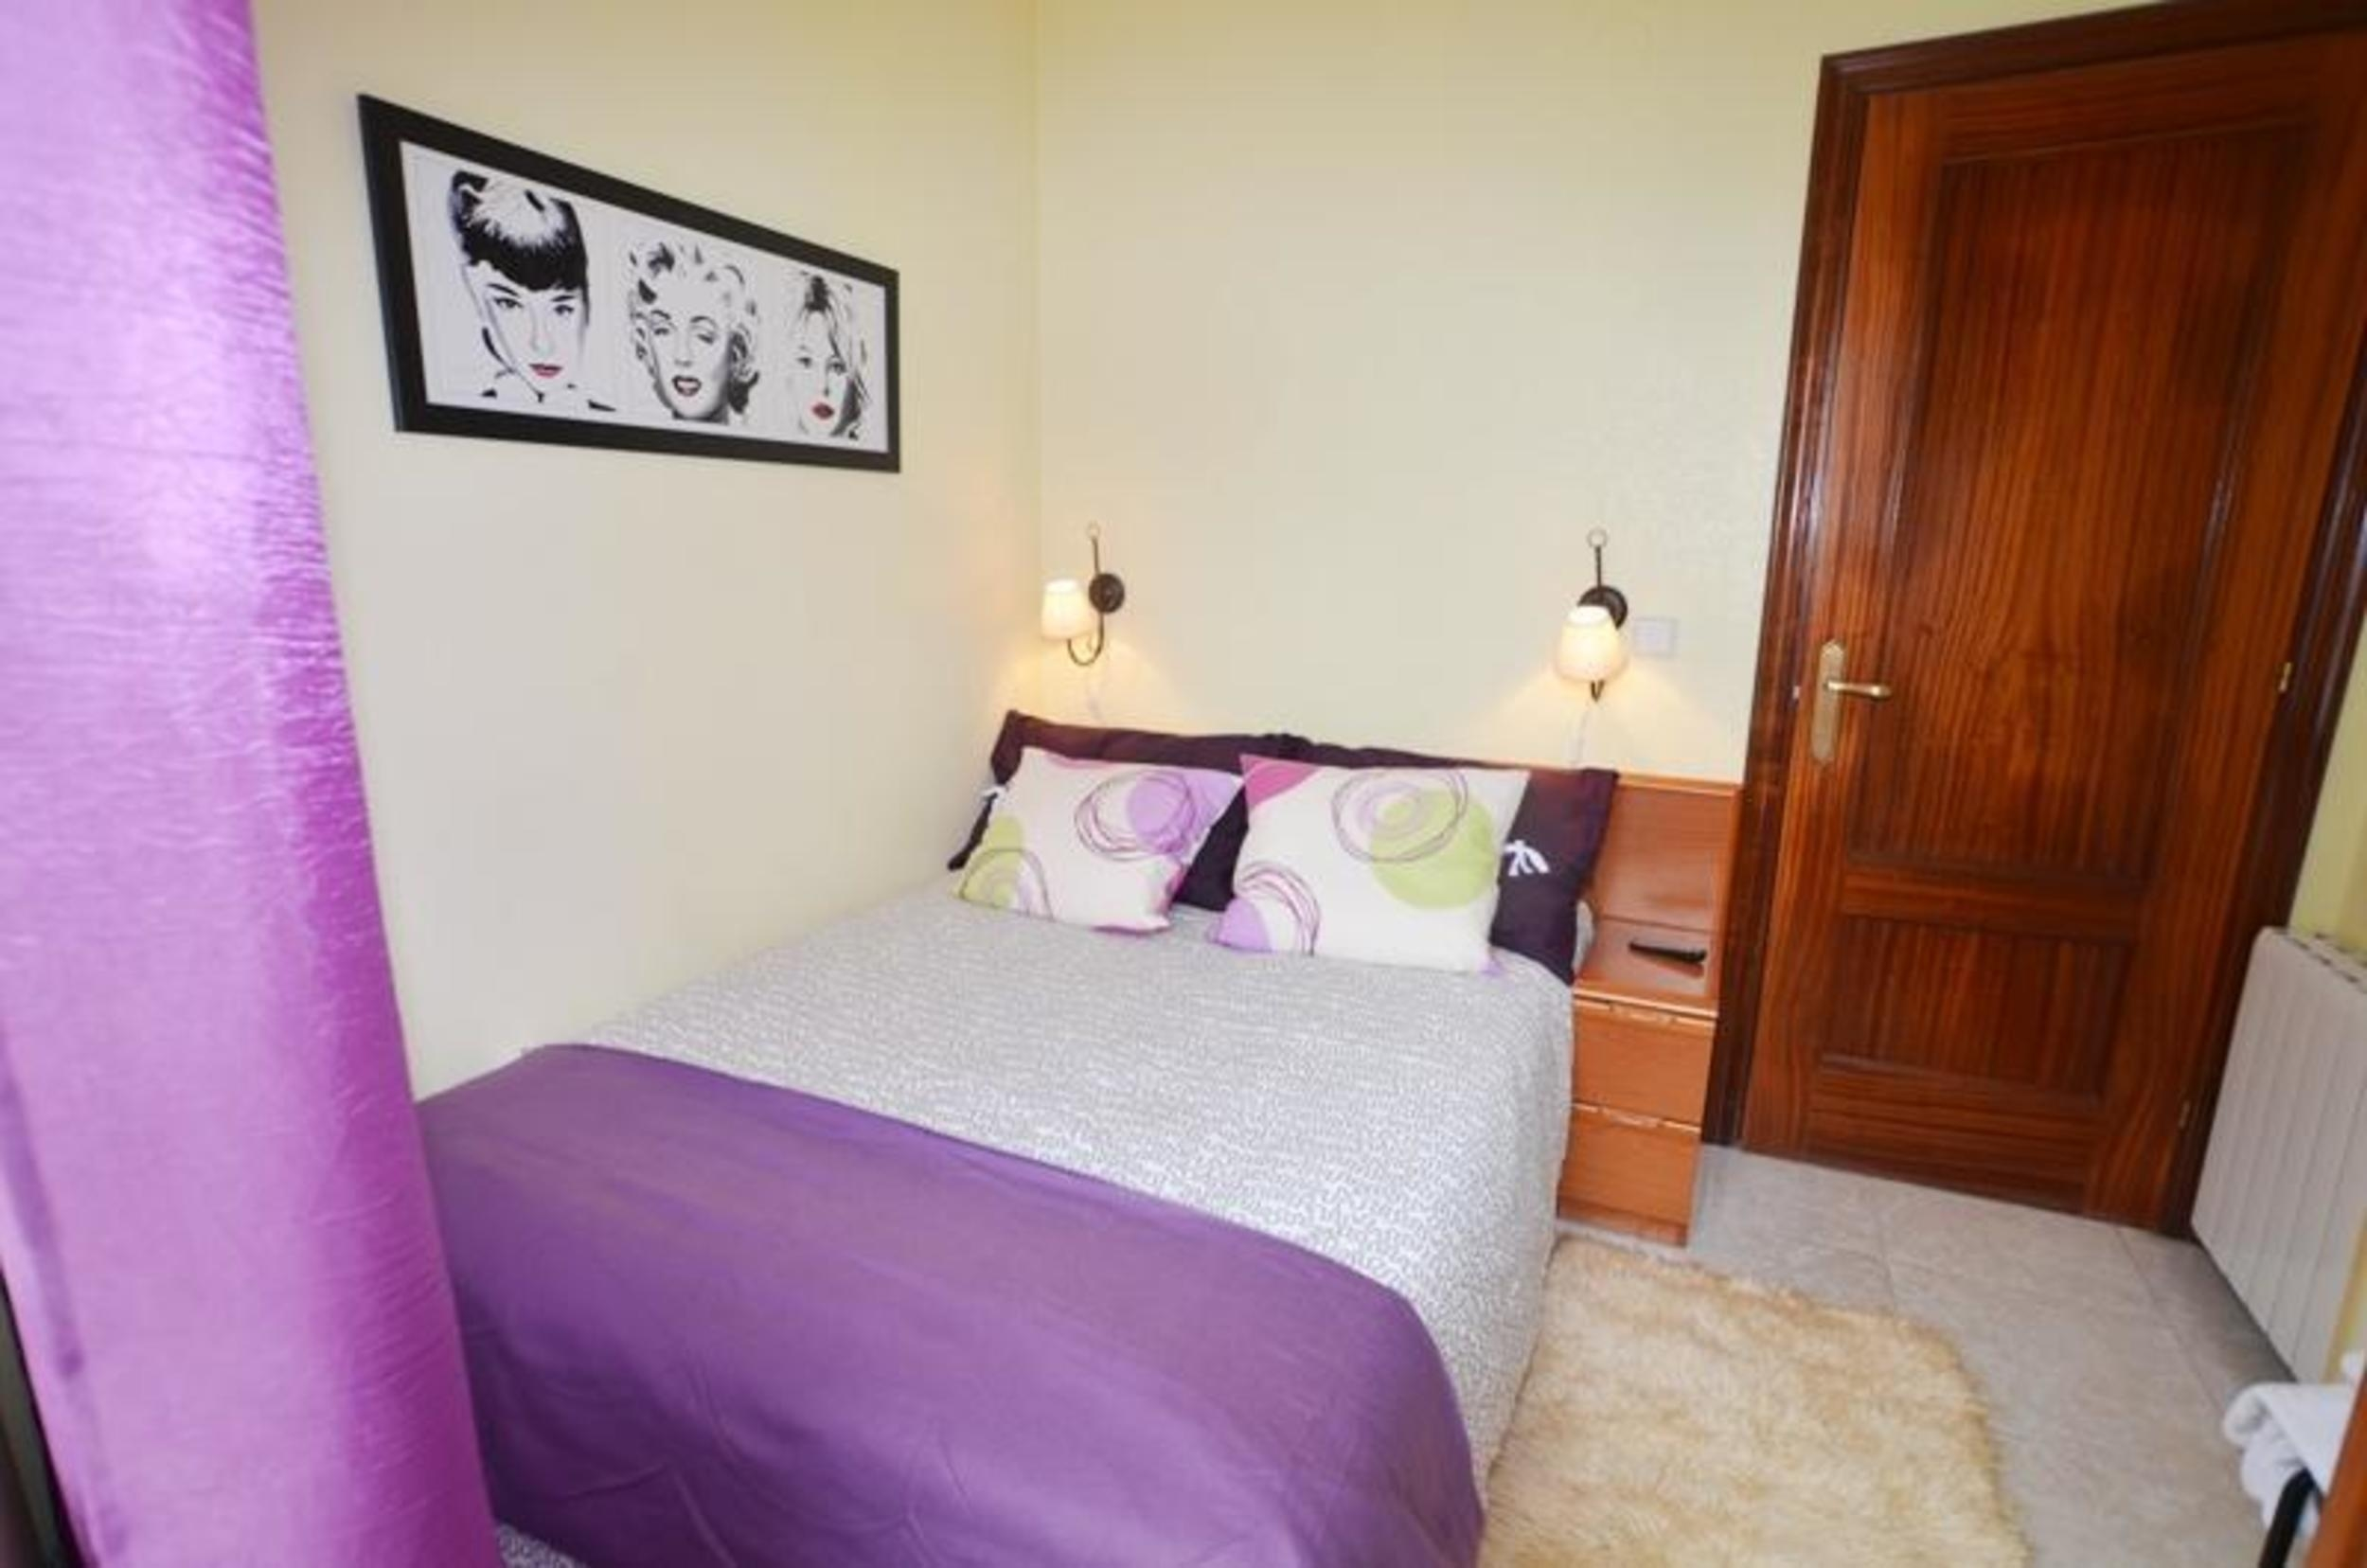 Ferienwohnung Apartment - 2 Bedrooms with Pool and Sea views - 102766 (2360874), Isla, Costa de Cantabria, Kantabrien, Spanien, Bild 4